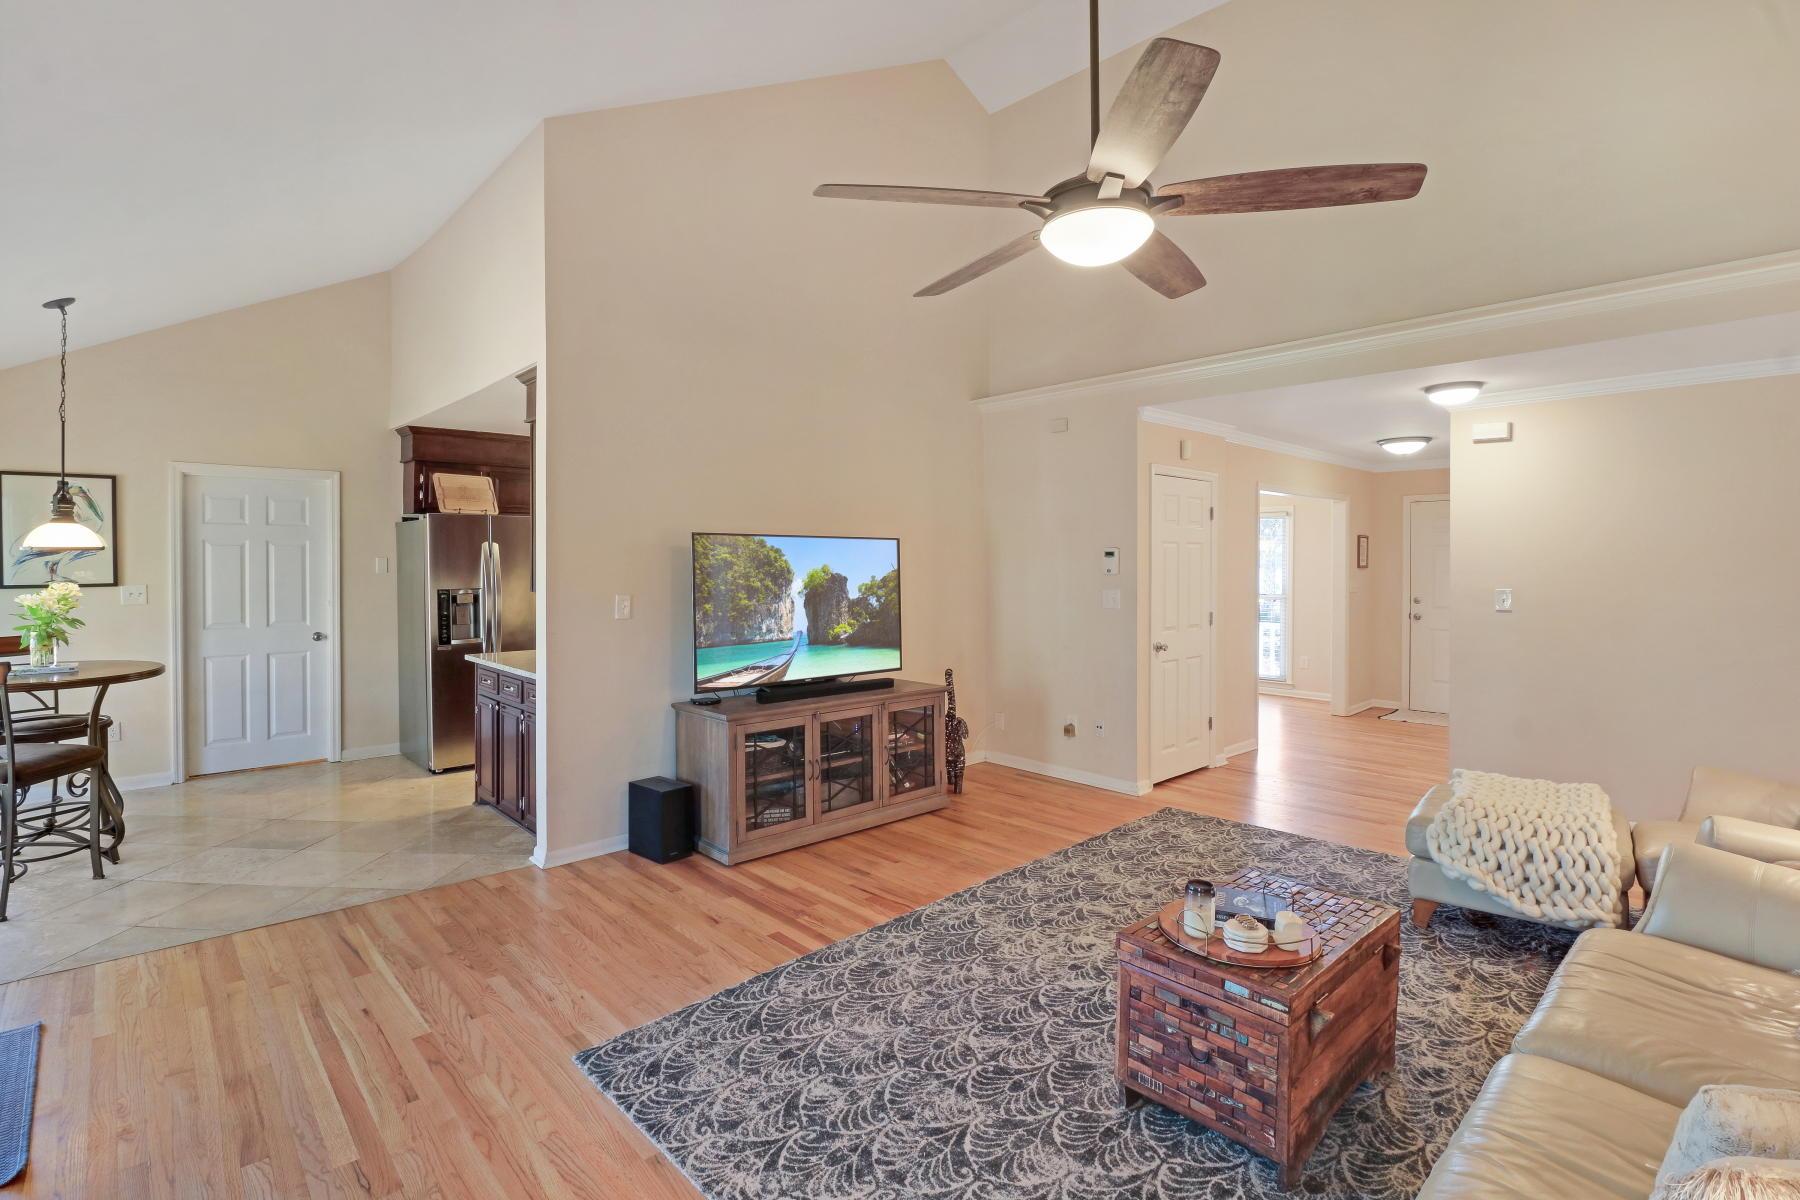 Harrison Acres Homes For Sale - 51 Markfield, Charleston, SC - 33